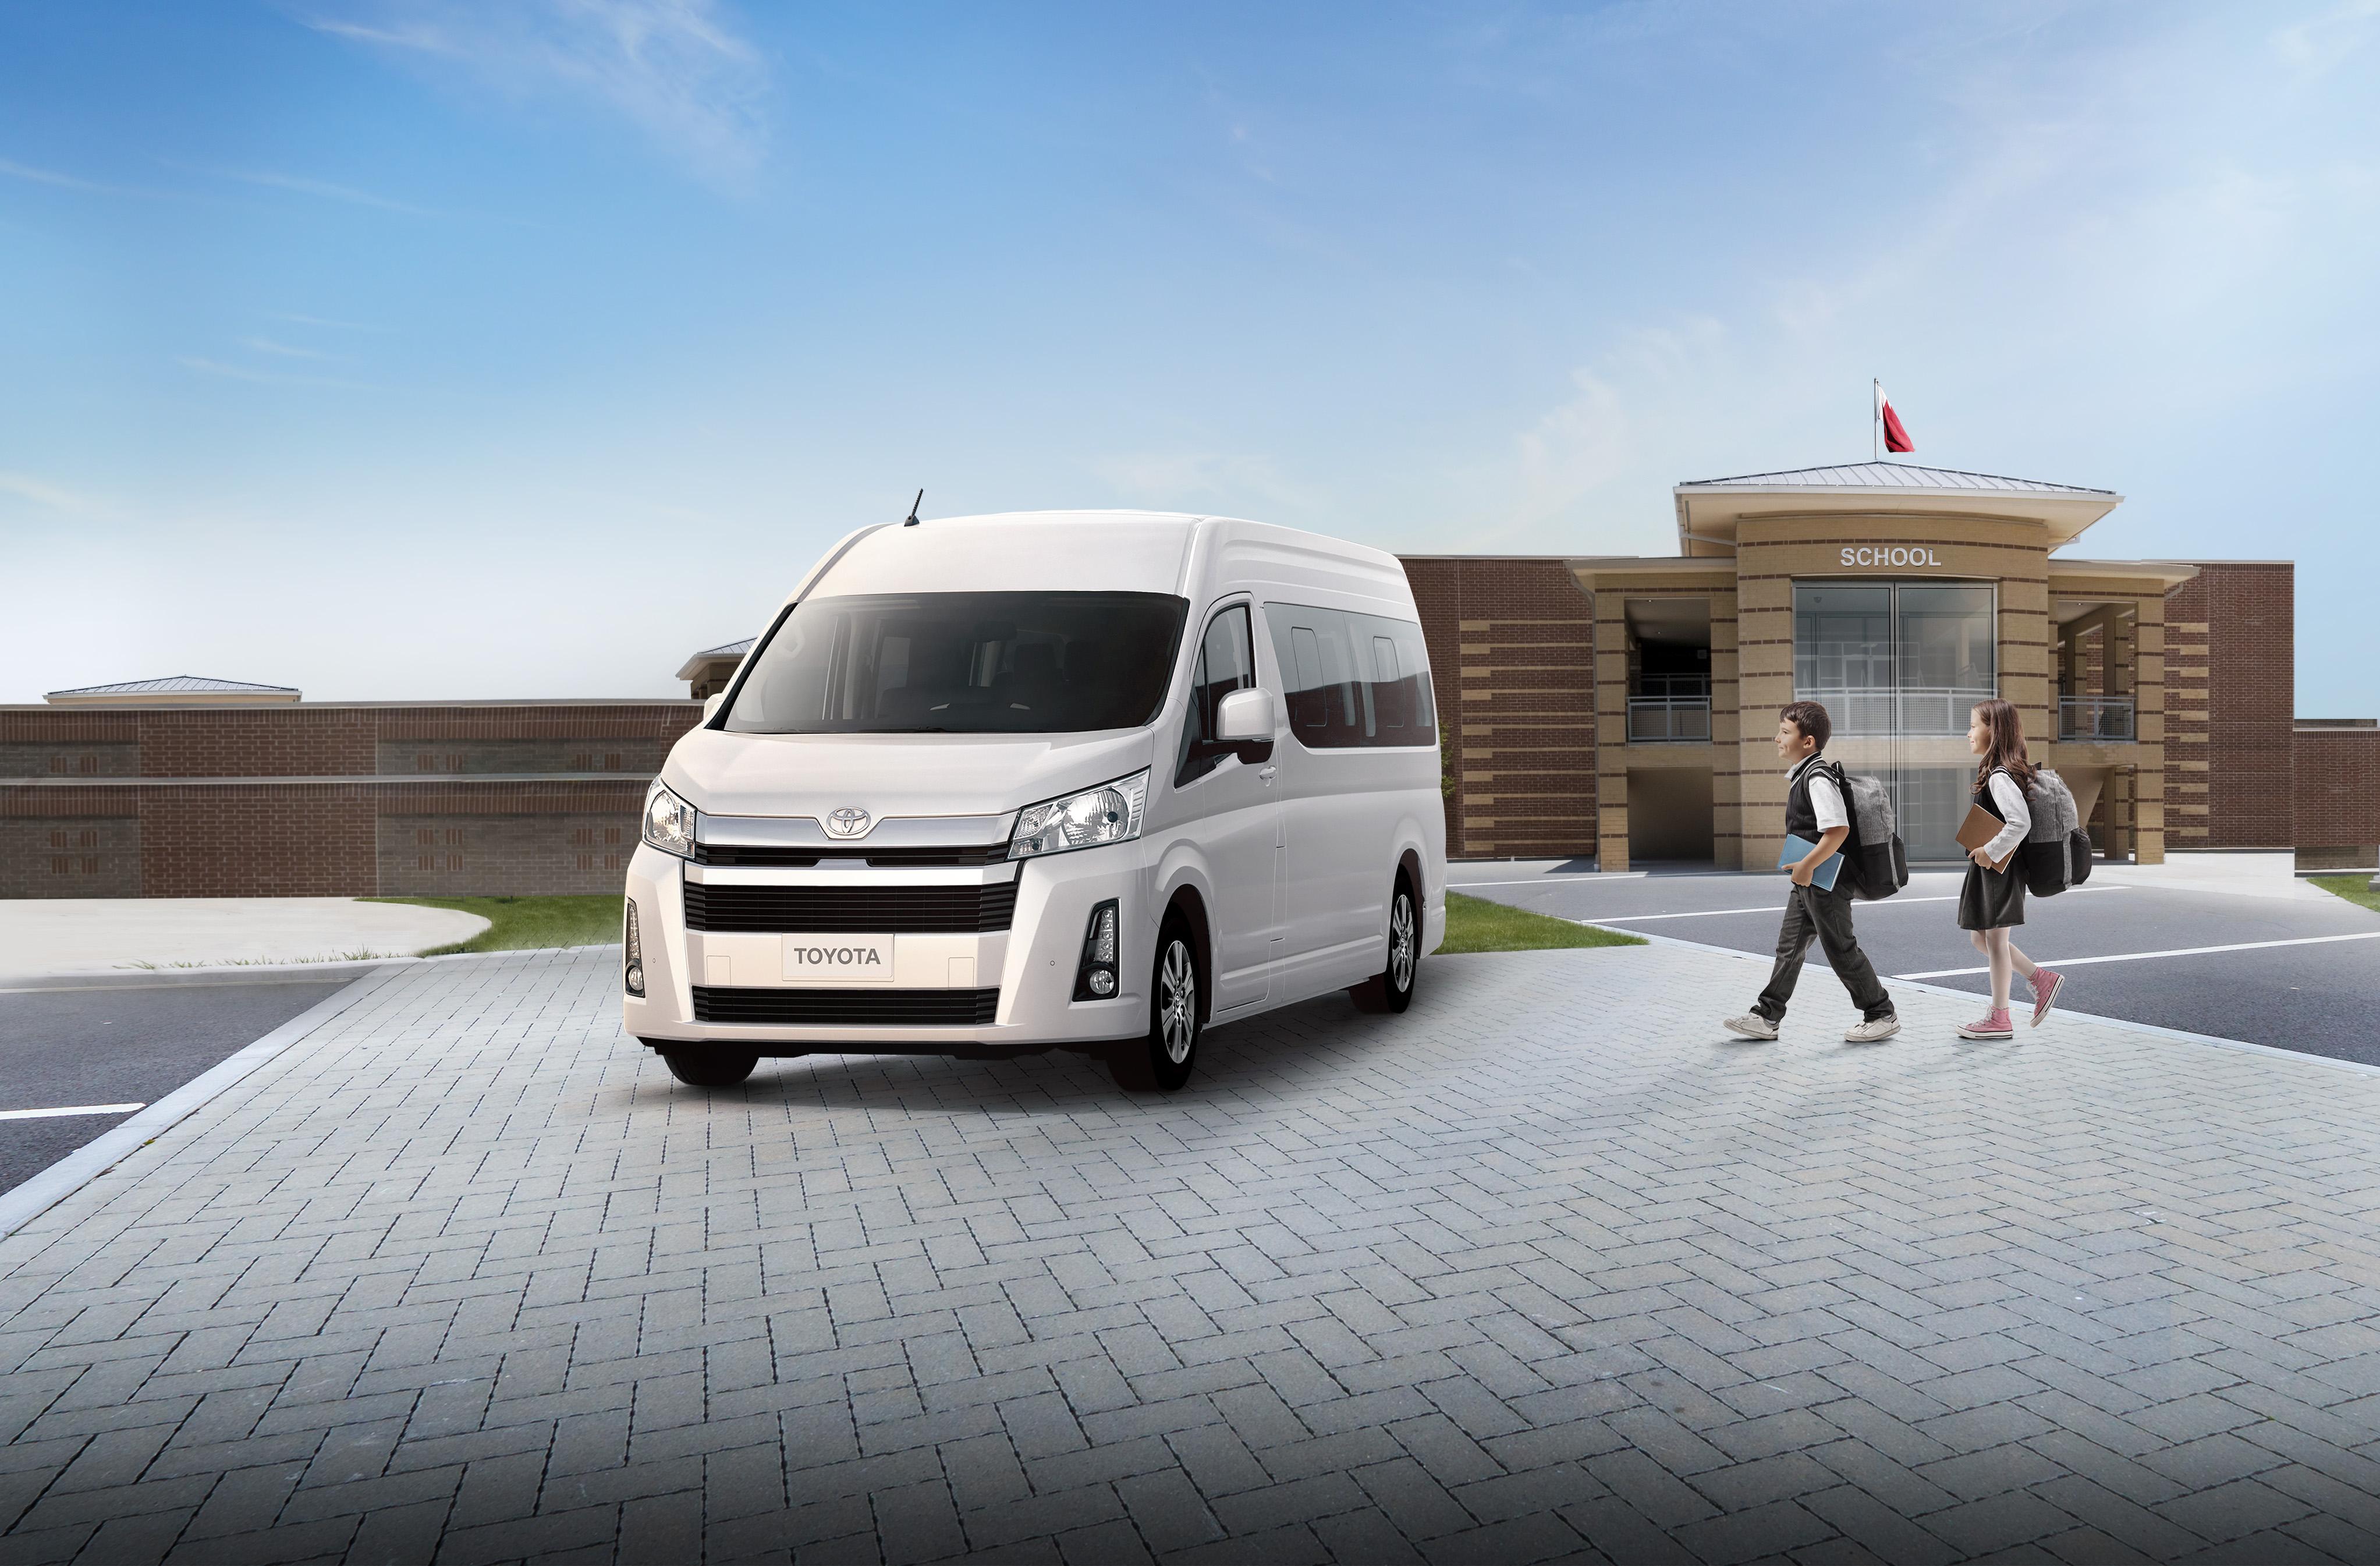 Toyota Bahrain official website - EK Kanoo